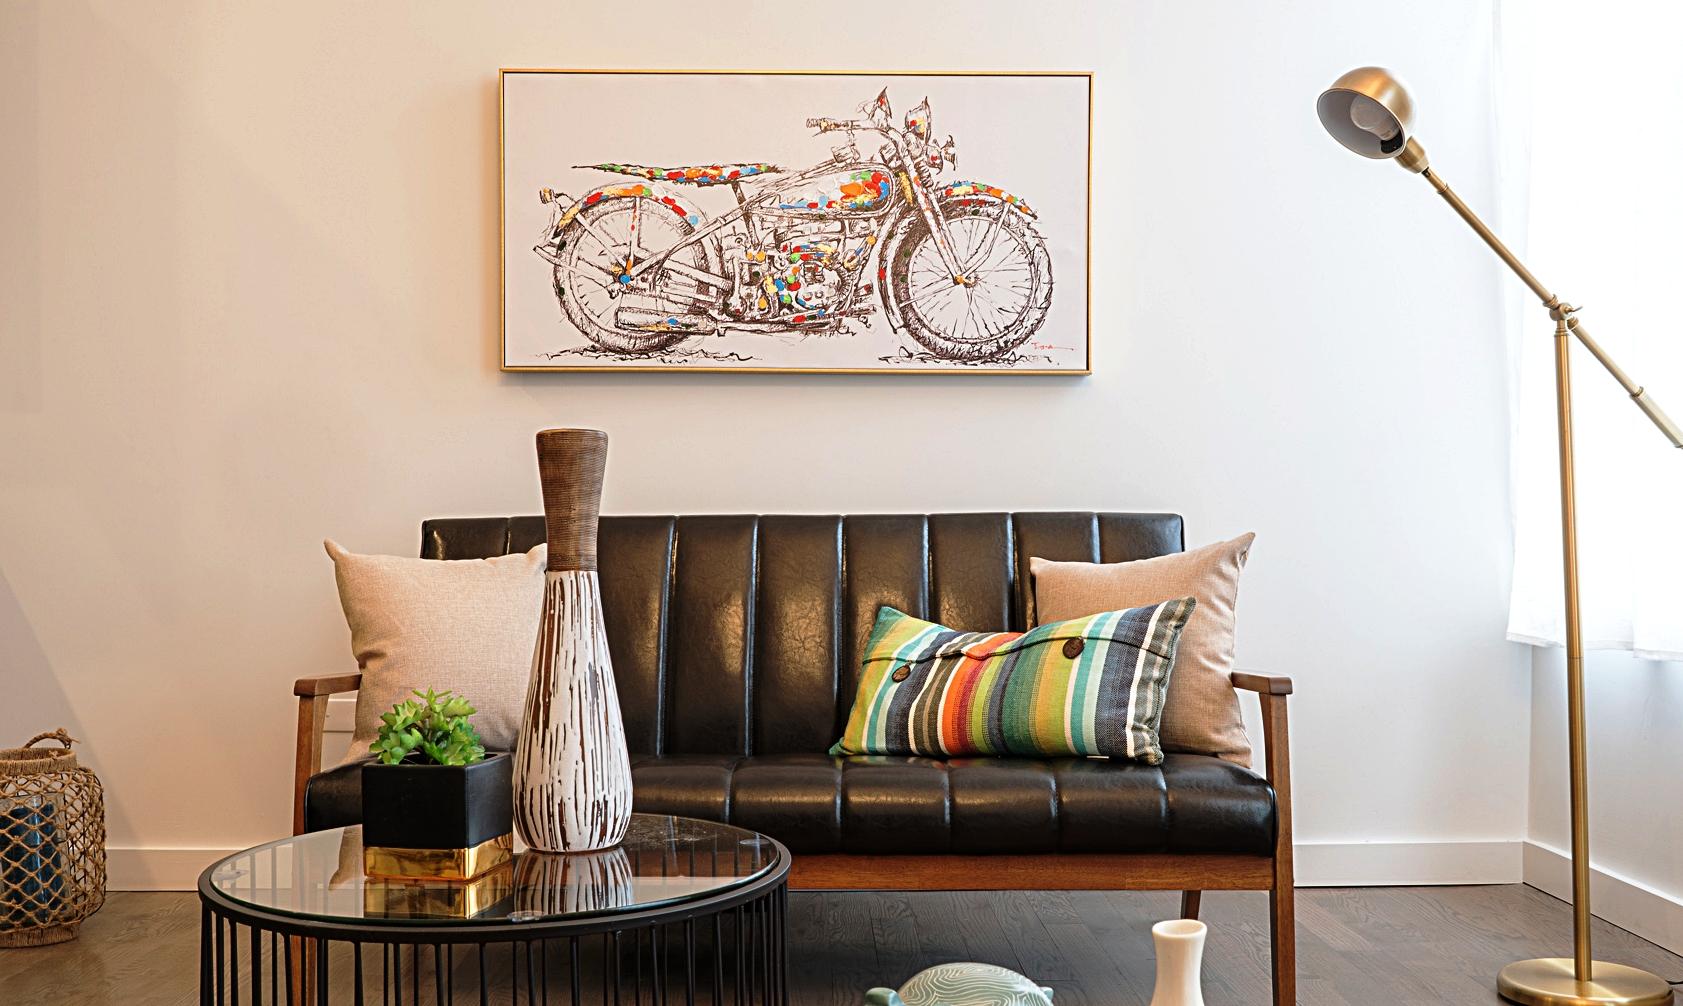 Sienna - 1 bedroom cirro suite